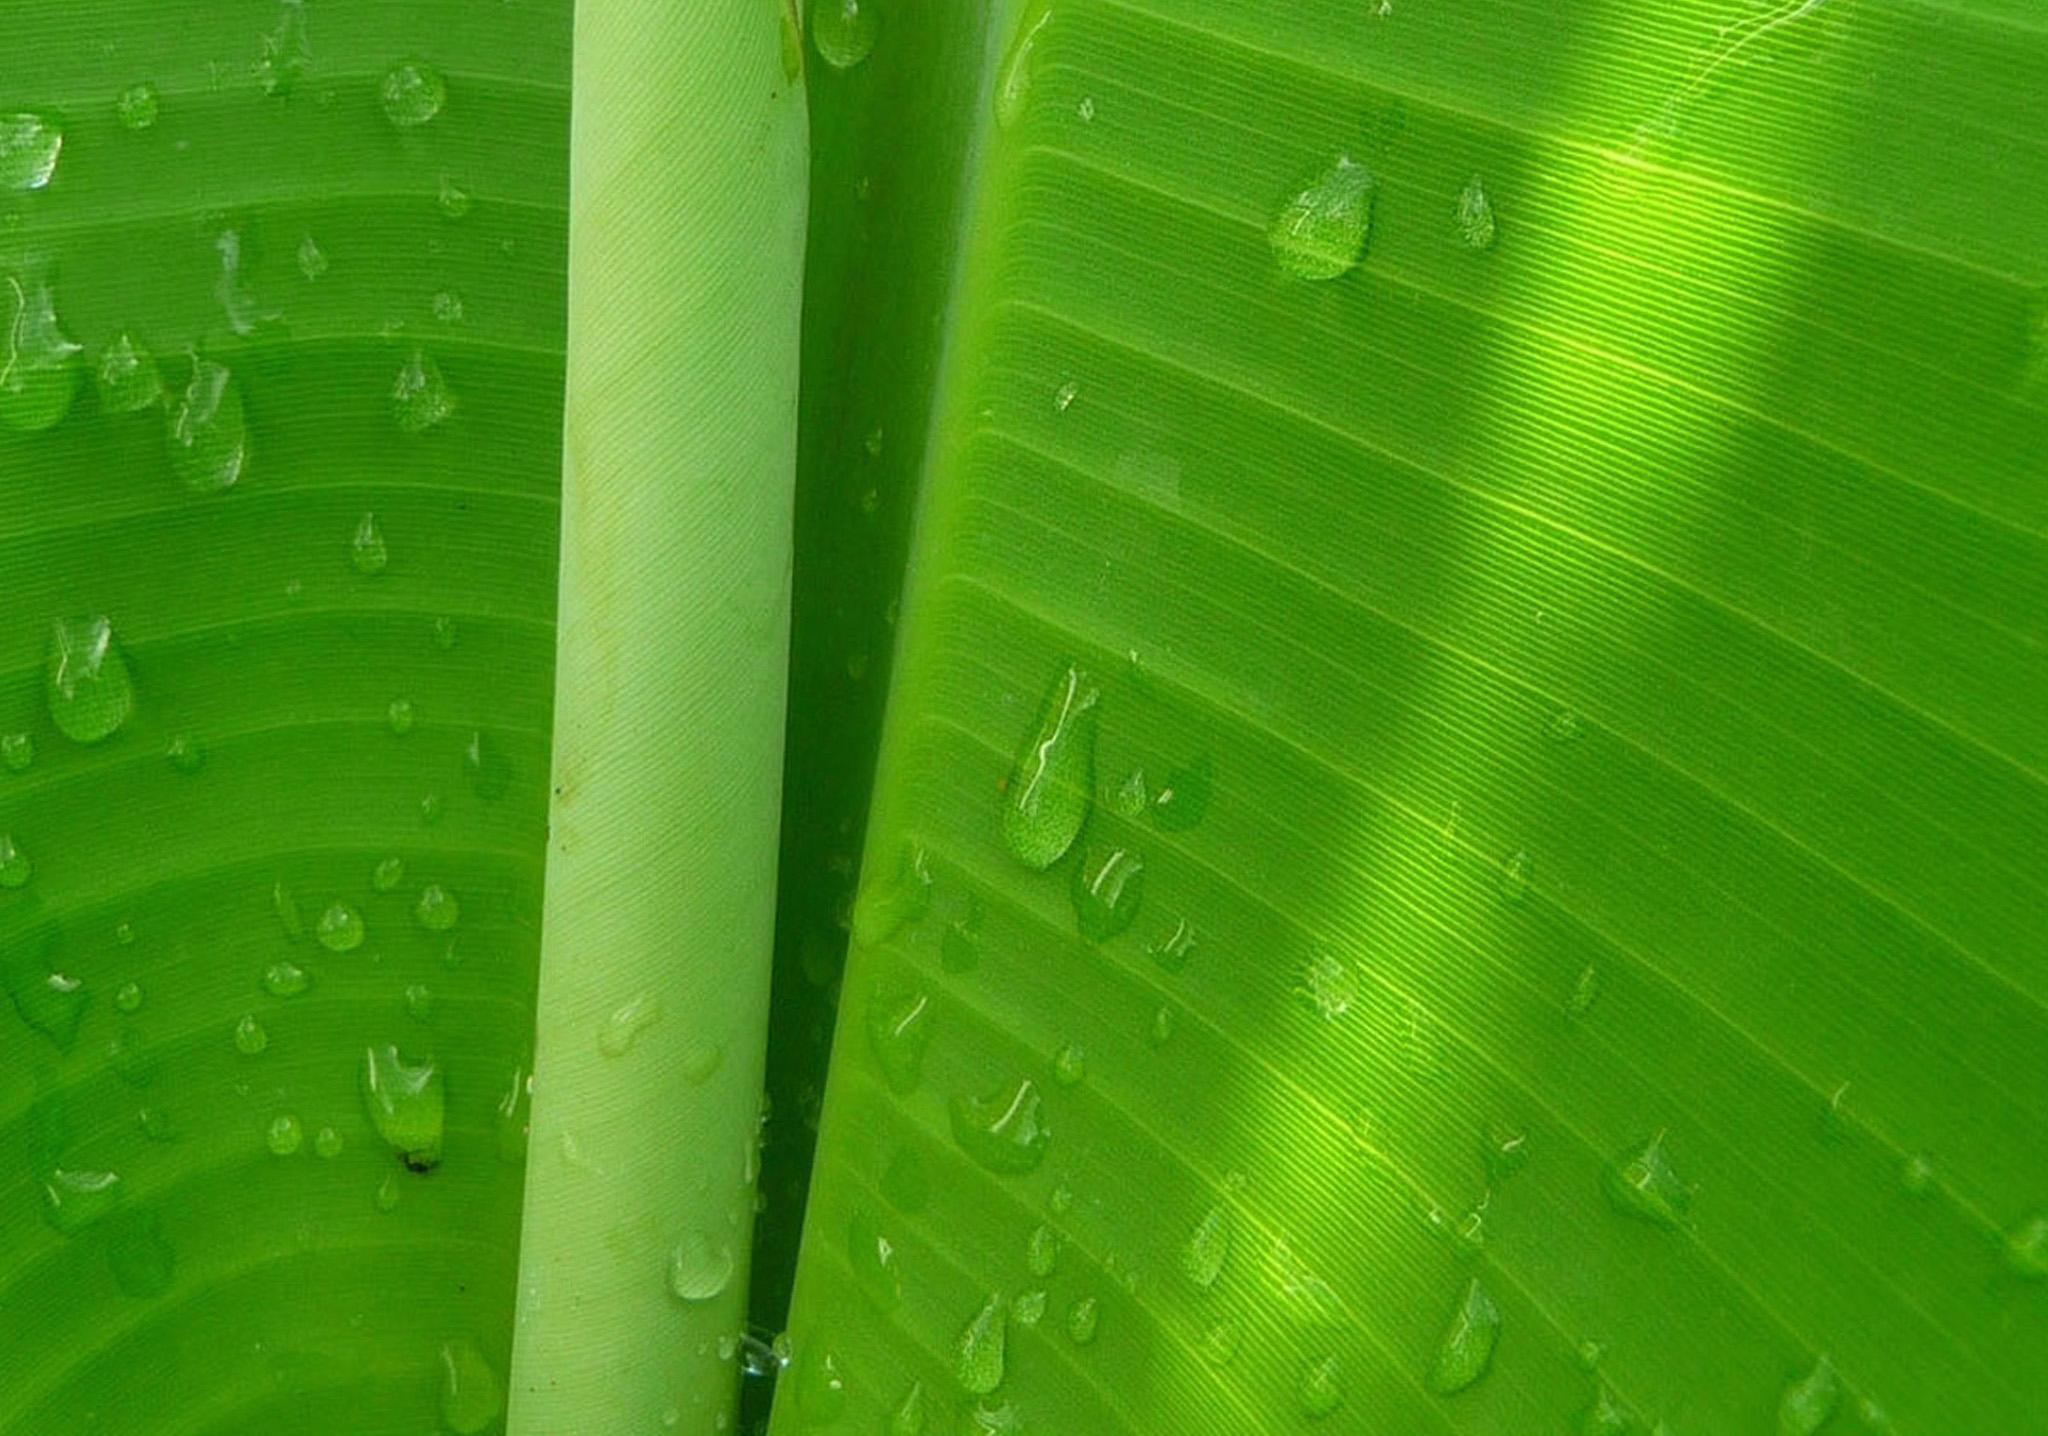 Best Quotes Wallpapers Hd For Desktop Banana Leaf Wallpapers Hd Pixelstalk Net